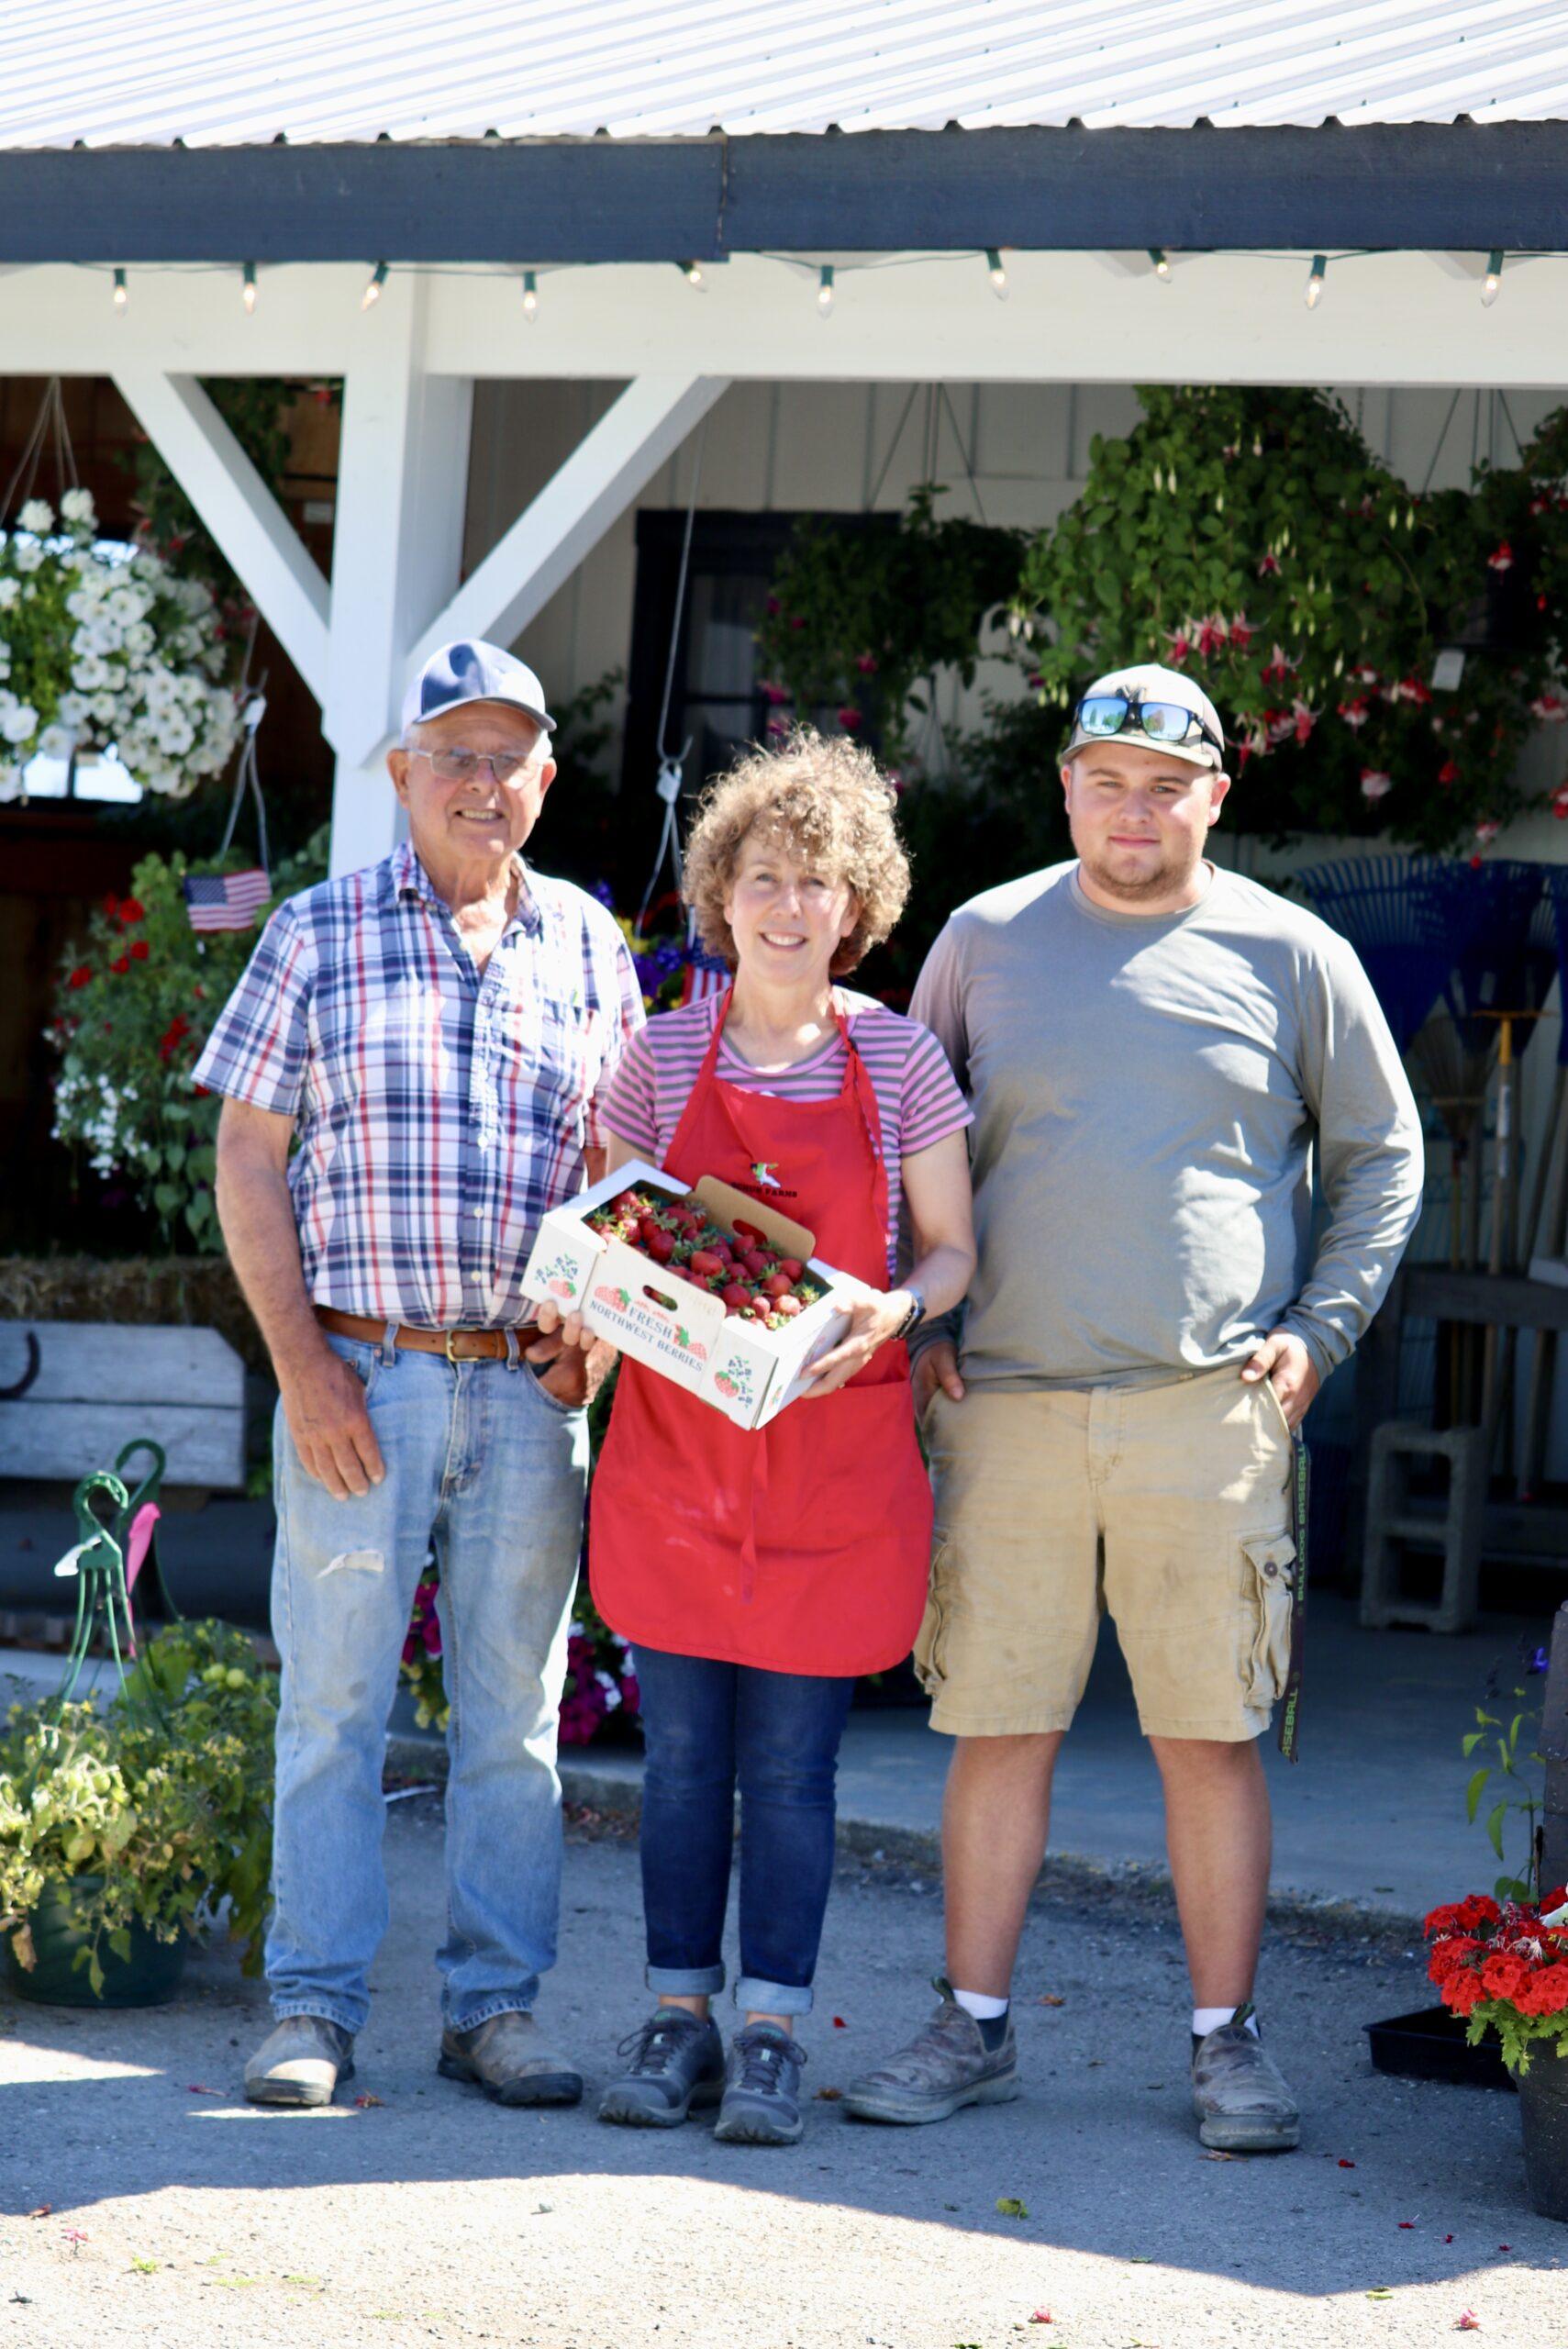 The Schuh Farms family in the Skagit Valley, Washington